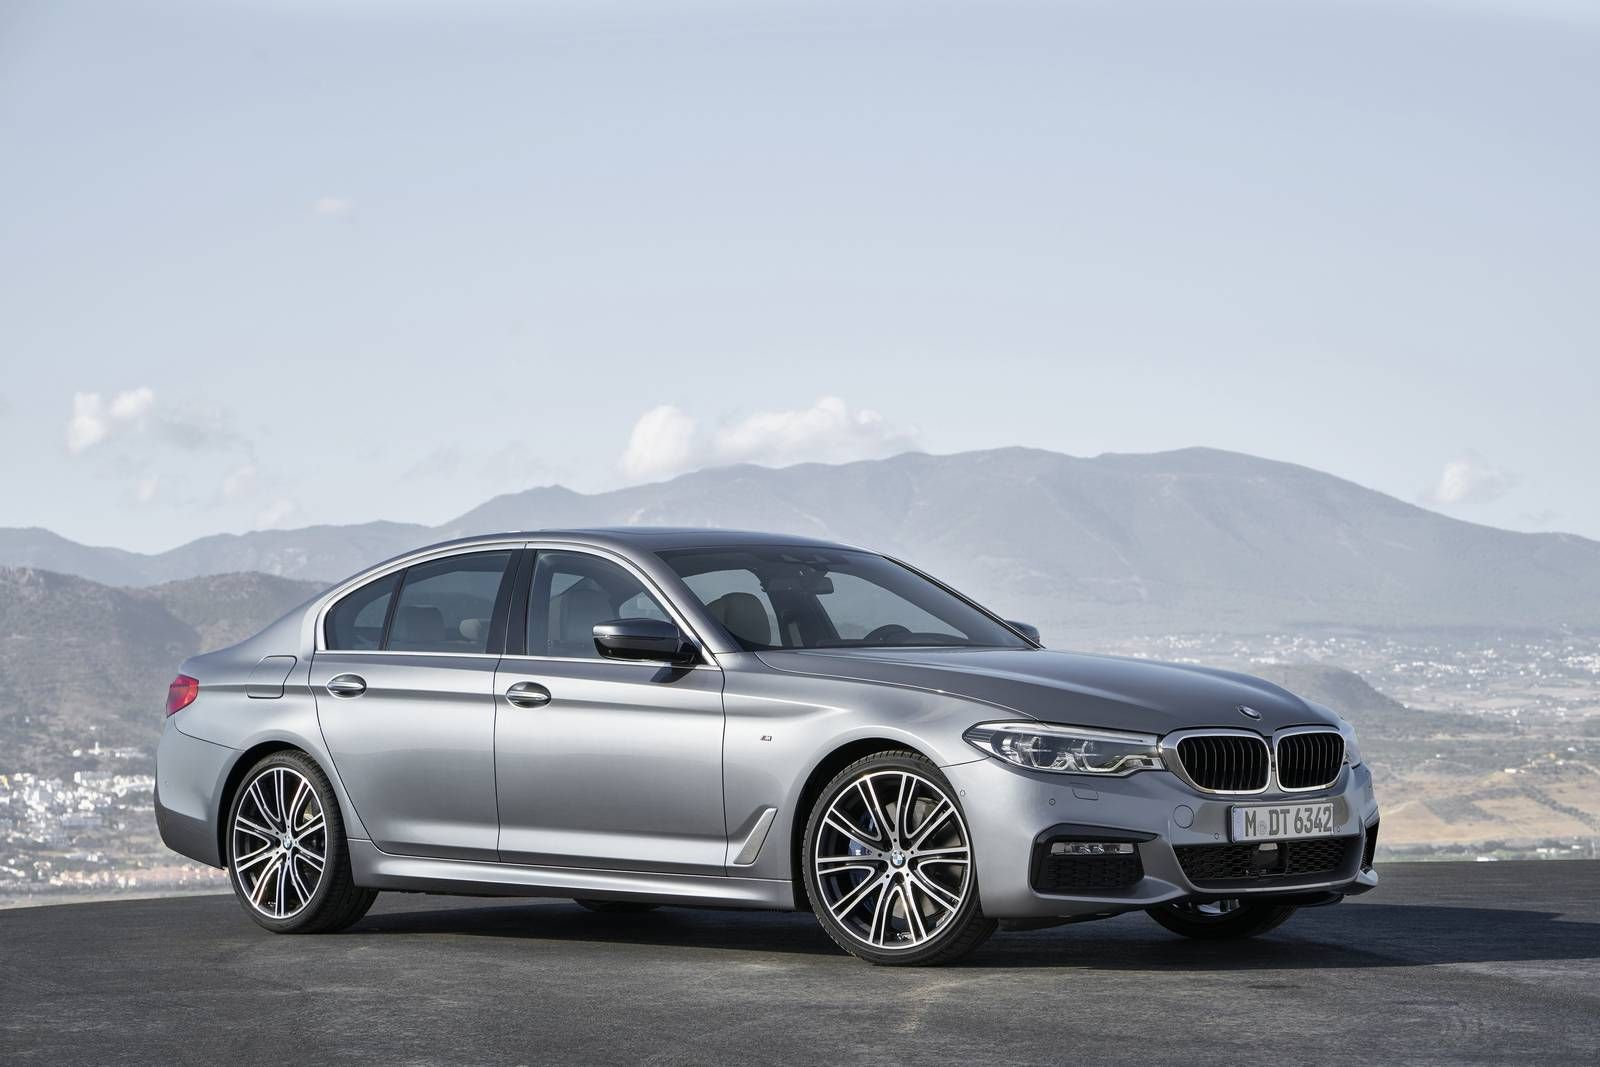 BMW Convertible bmw 5er g30 Official: 2018 BMW G30 5 Series - GTspirit   best design ...